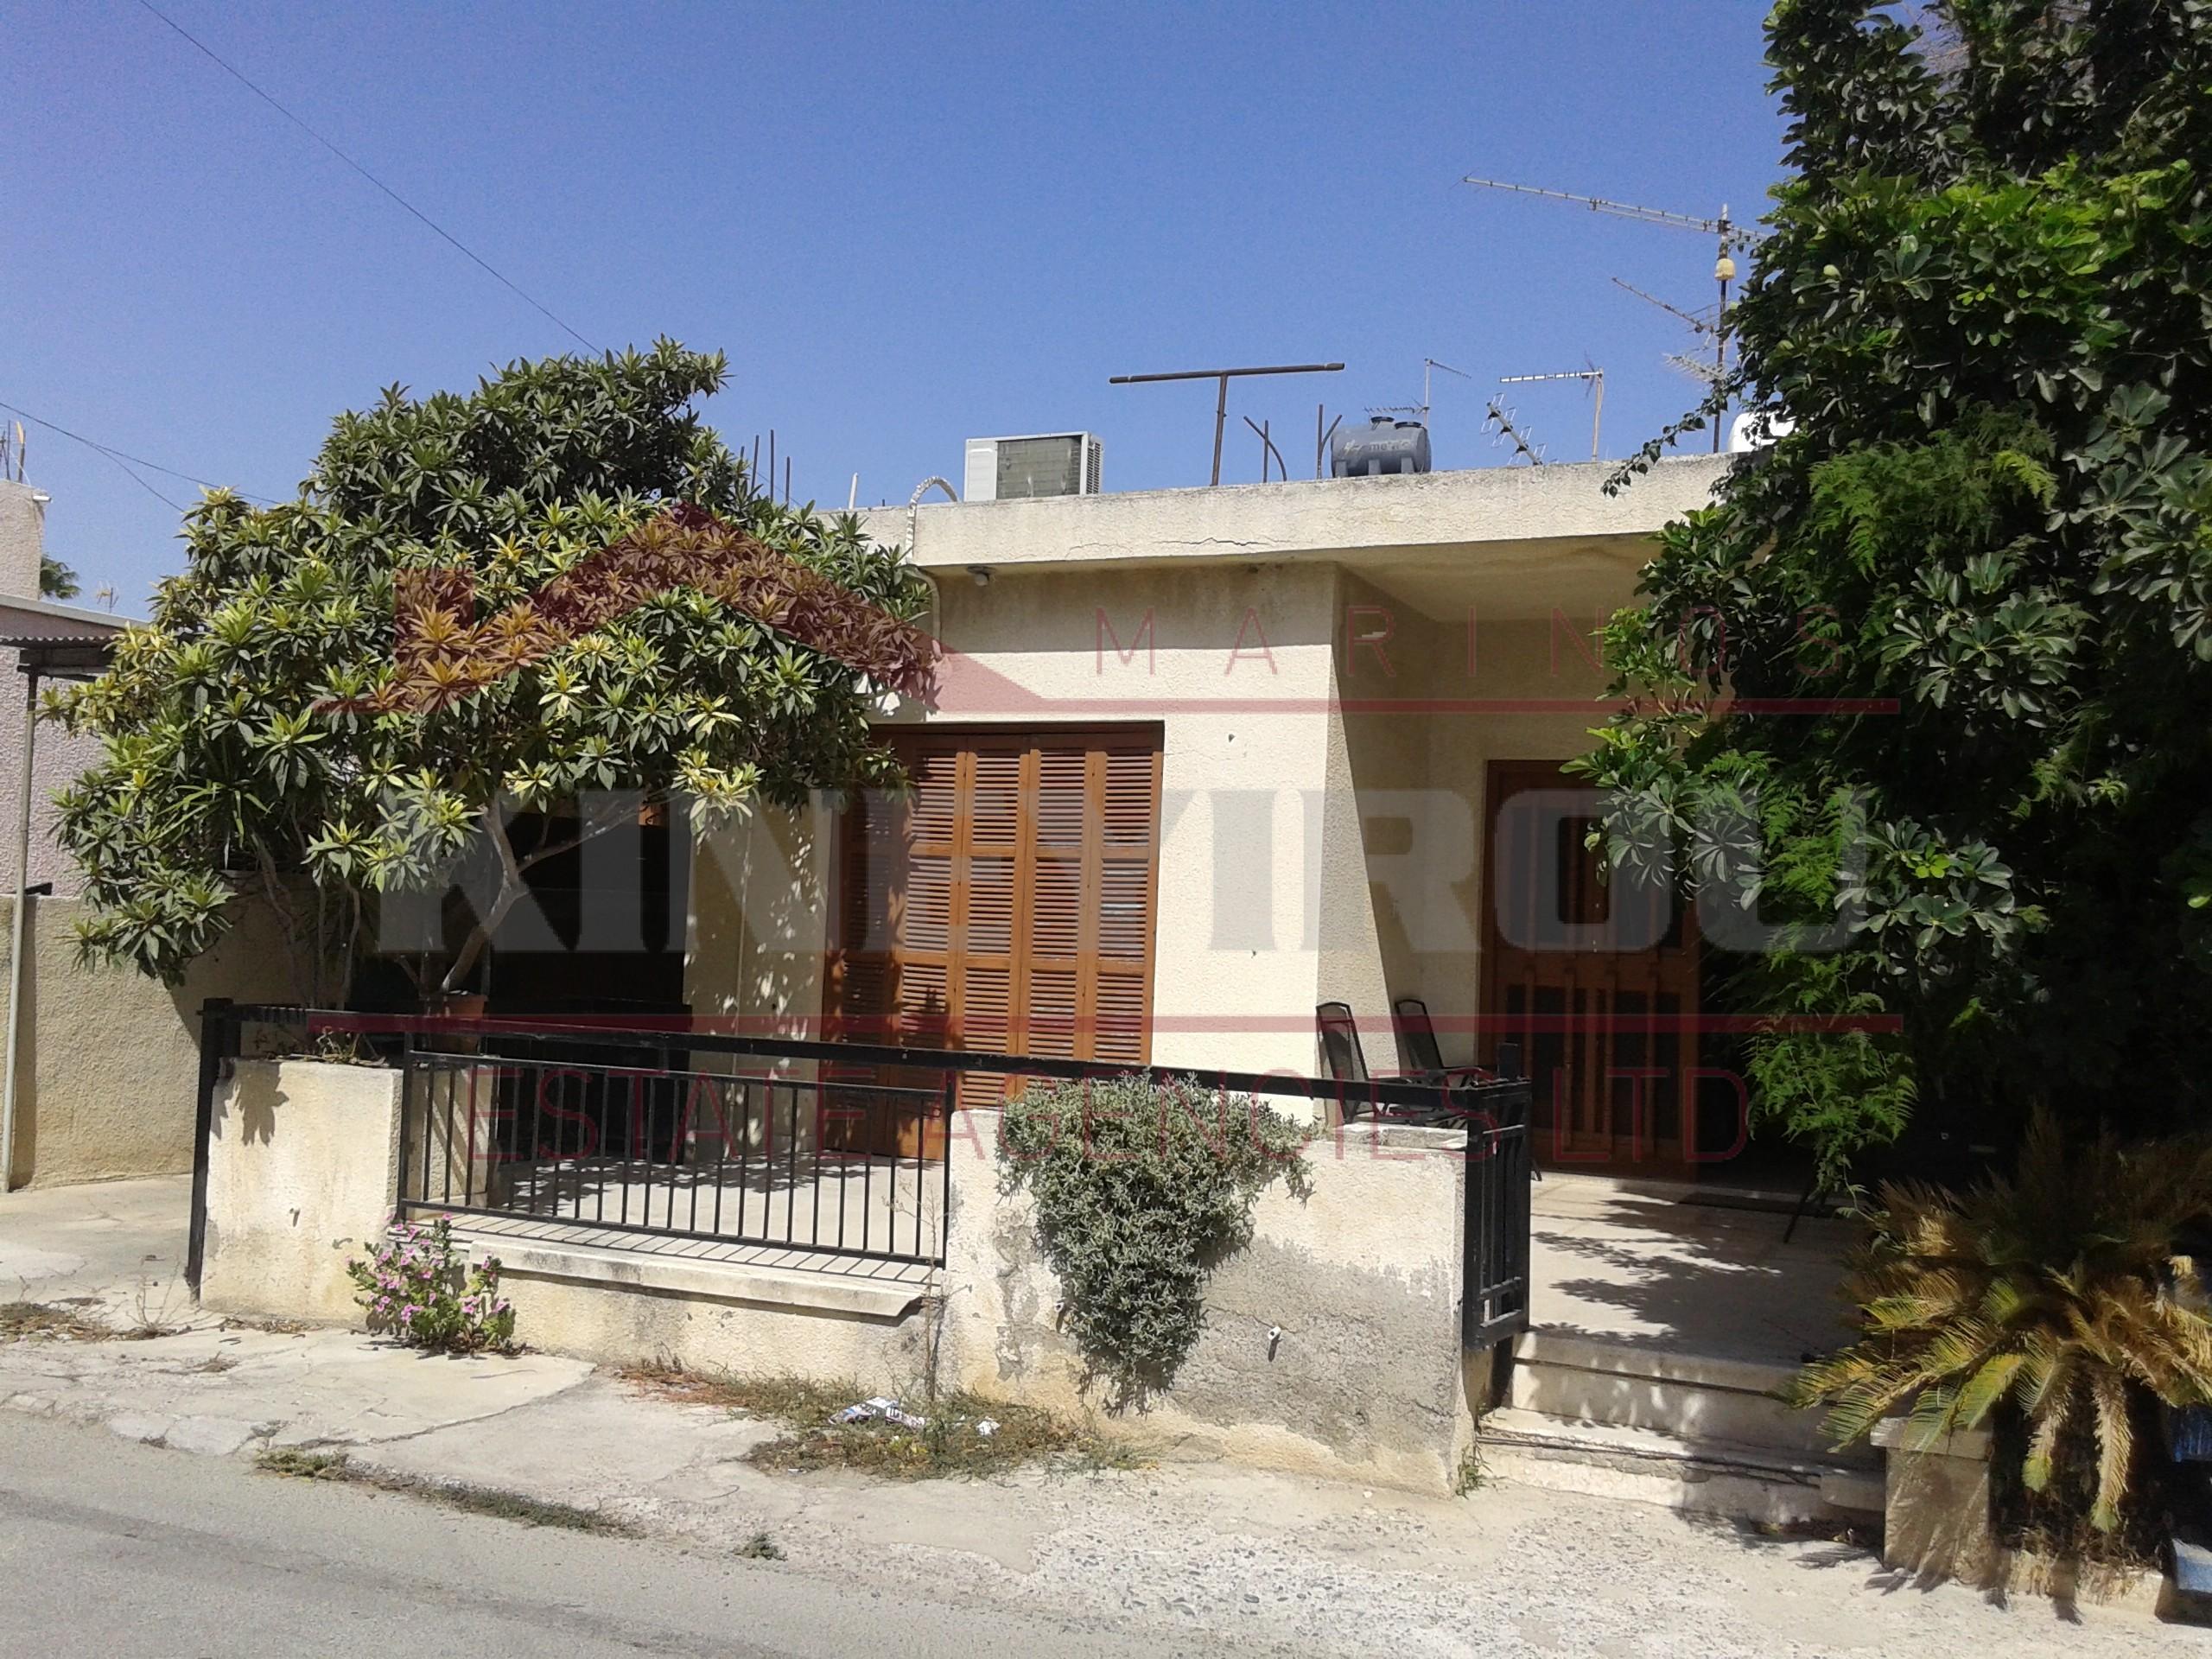 3 bedroom house for sale in drosia larnaca cyprus for 0 bedroom house for sale